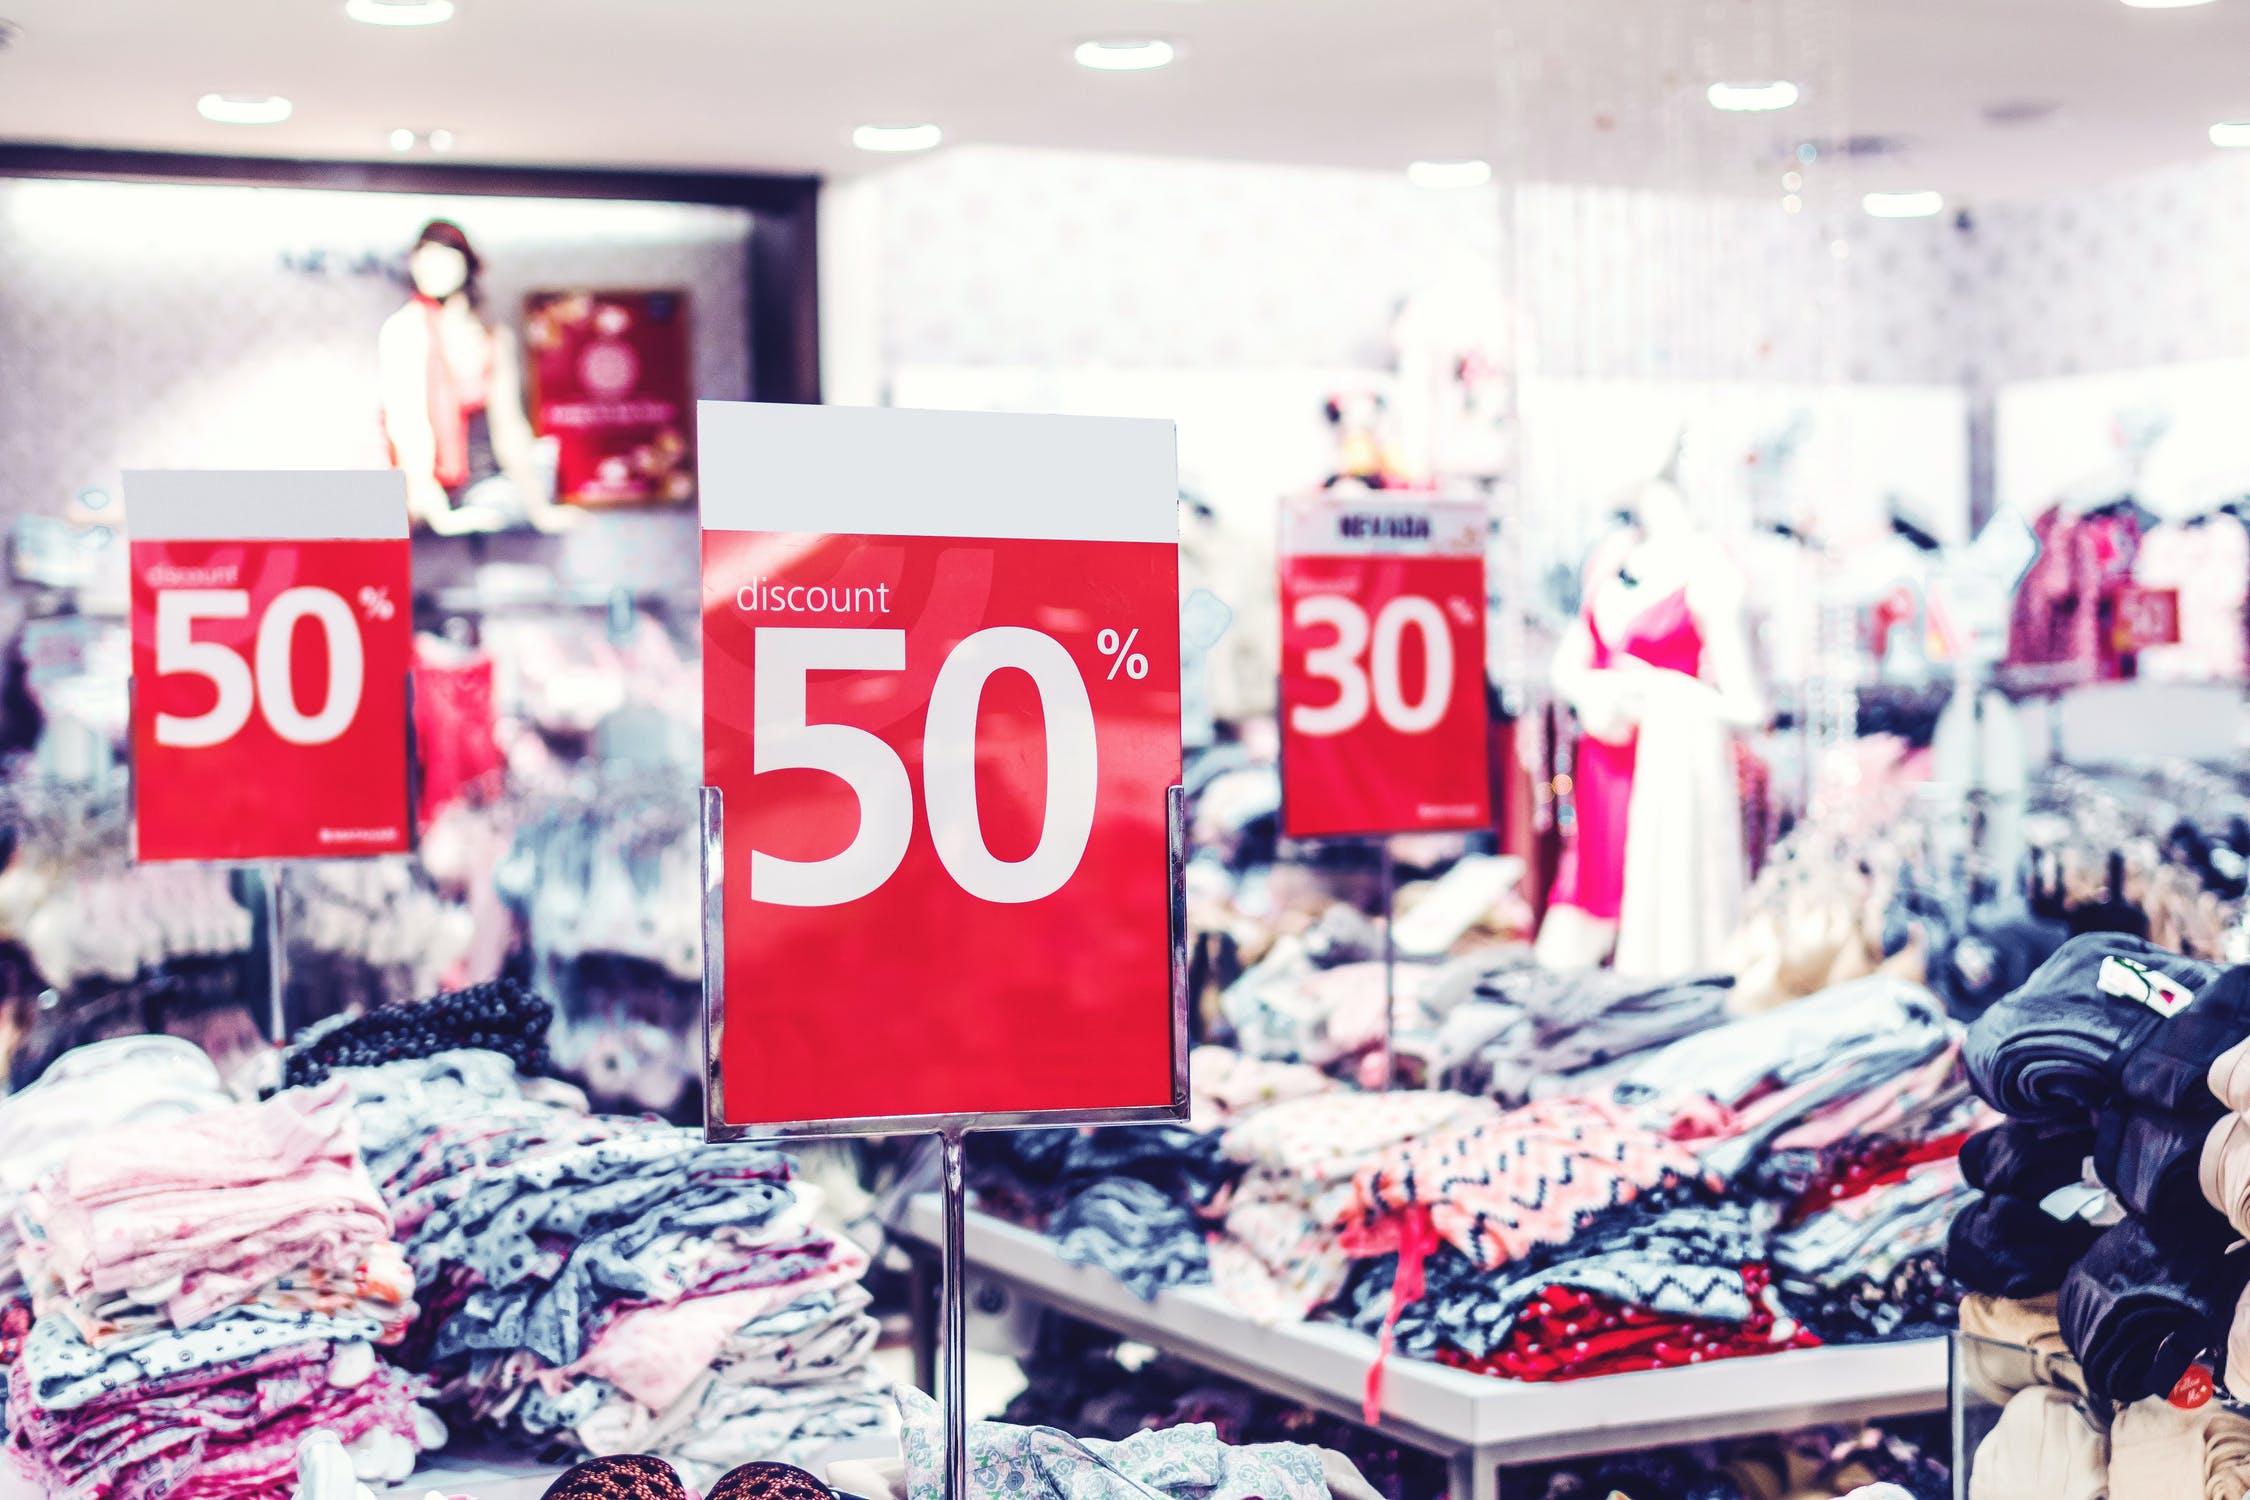 price scraper what is